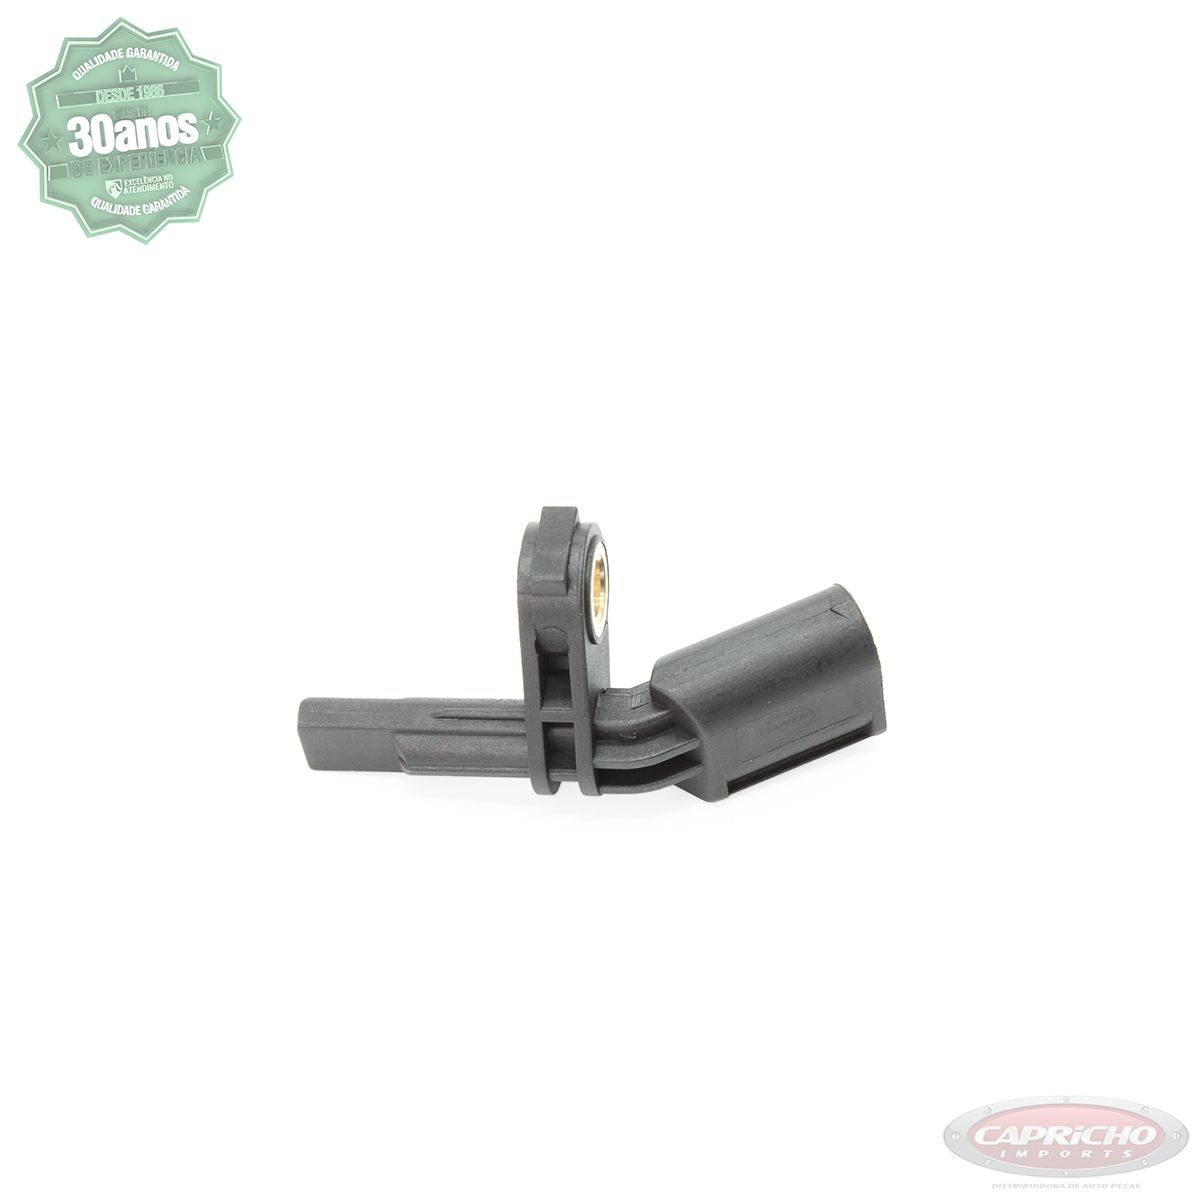 Sensor de Freio Abs Dianteiro Esquerdo Volkswagen Golf / Audi A3 - 7H0927804